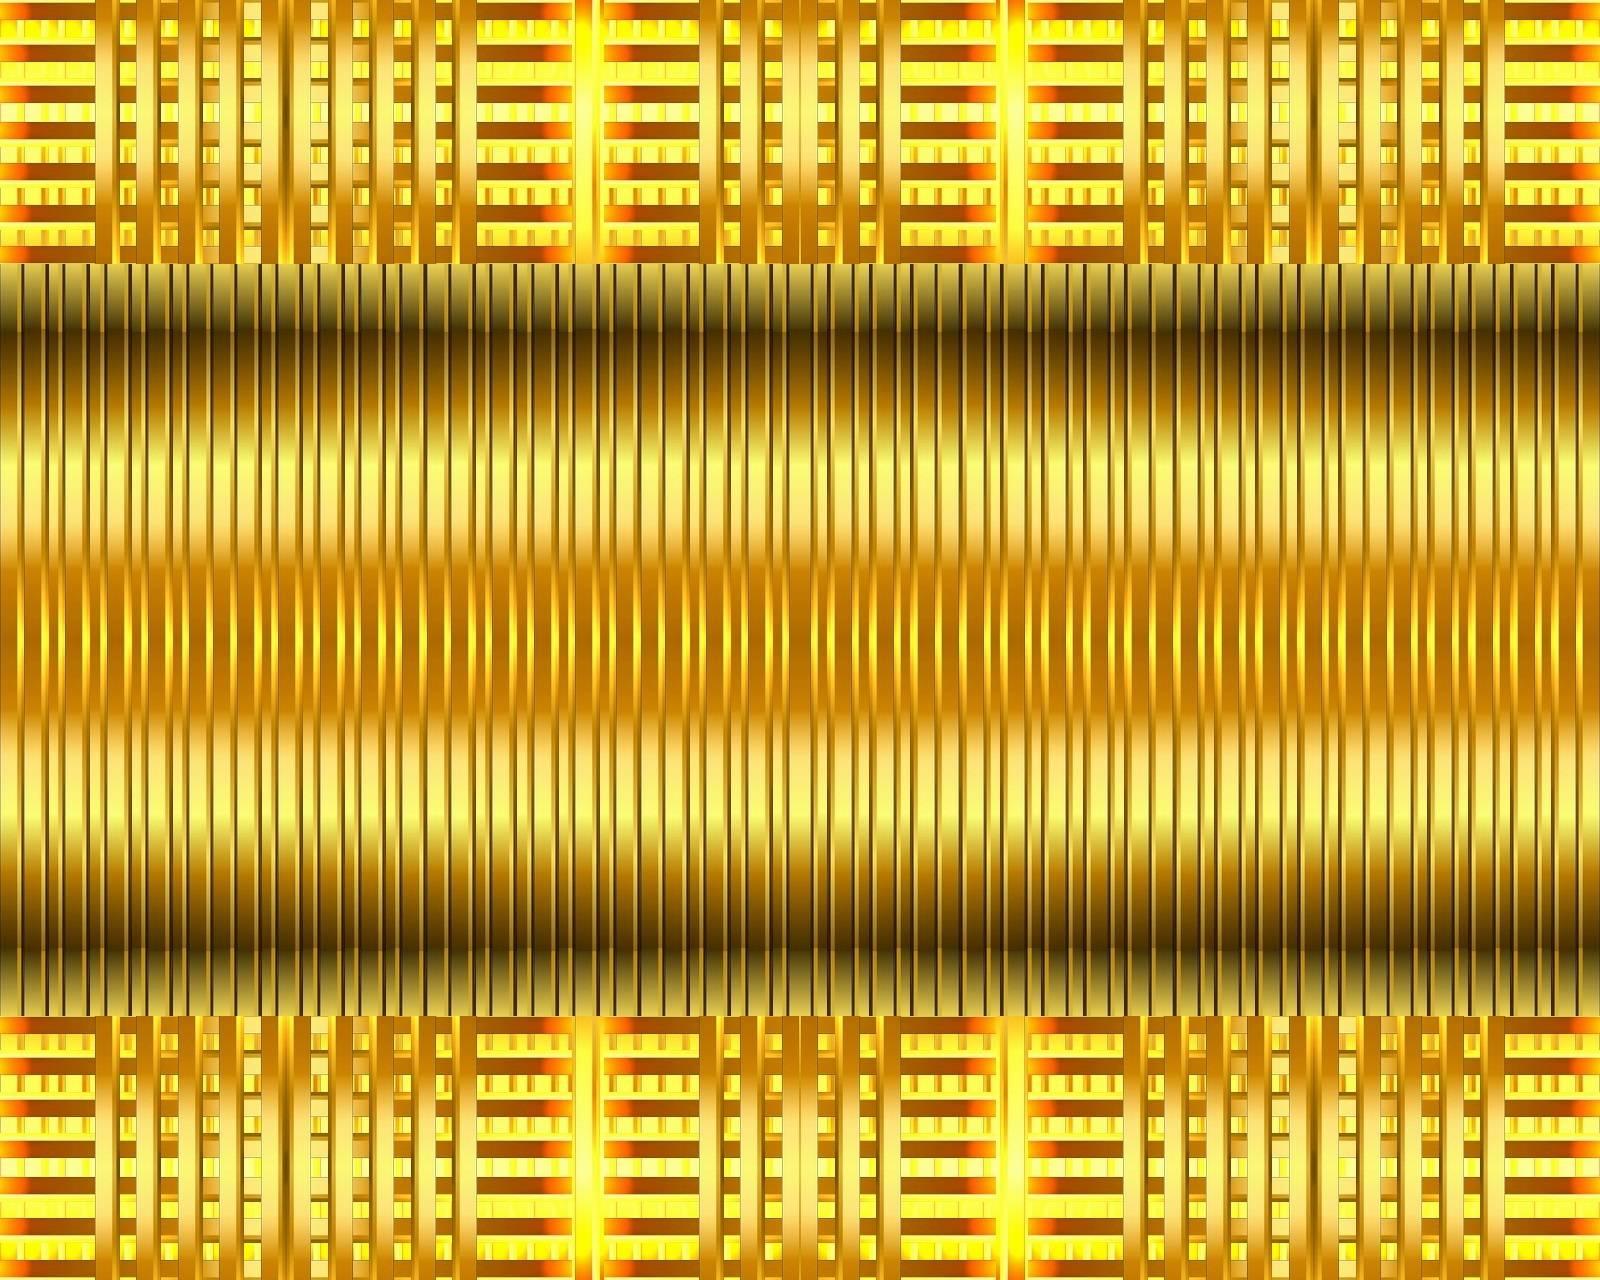 Gold Topz